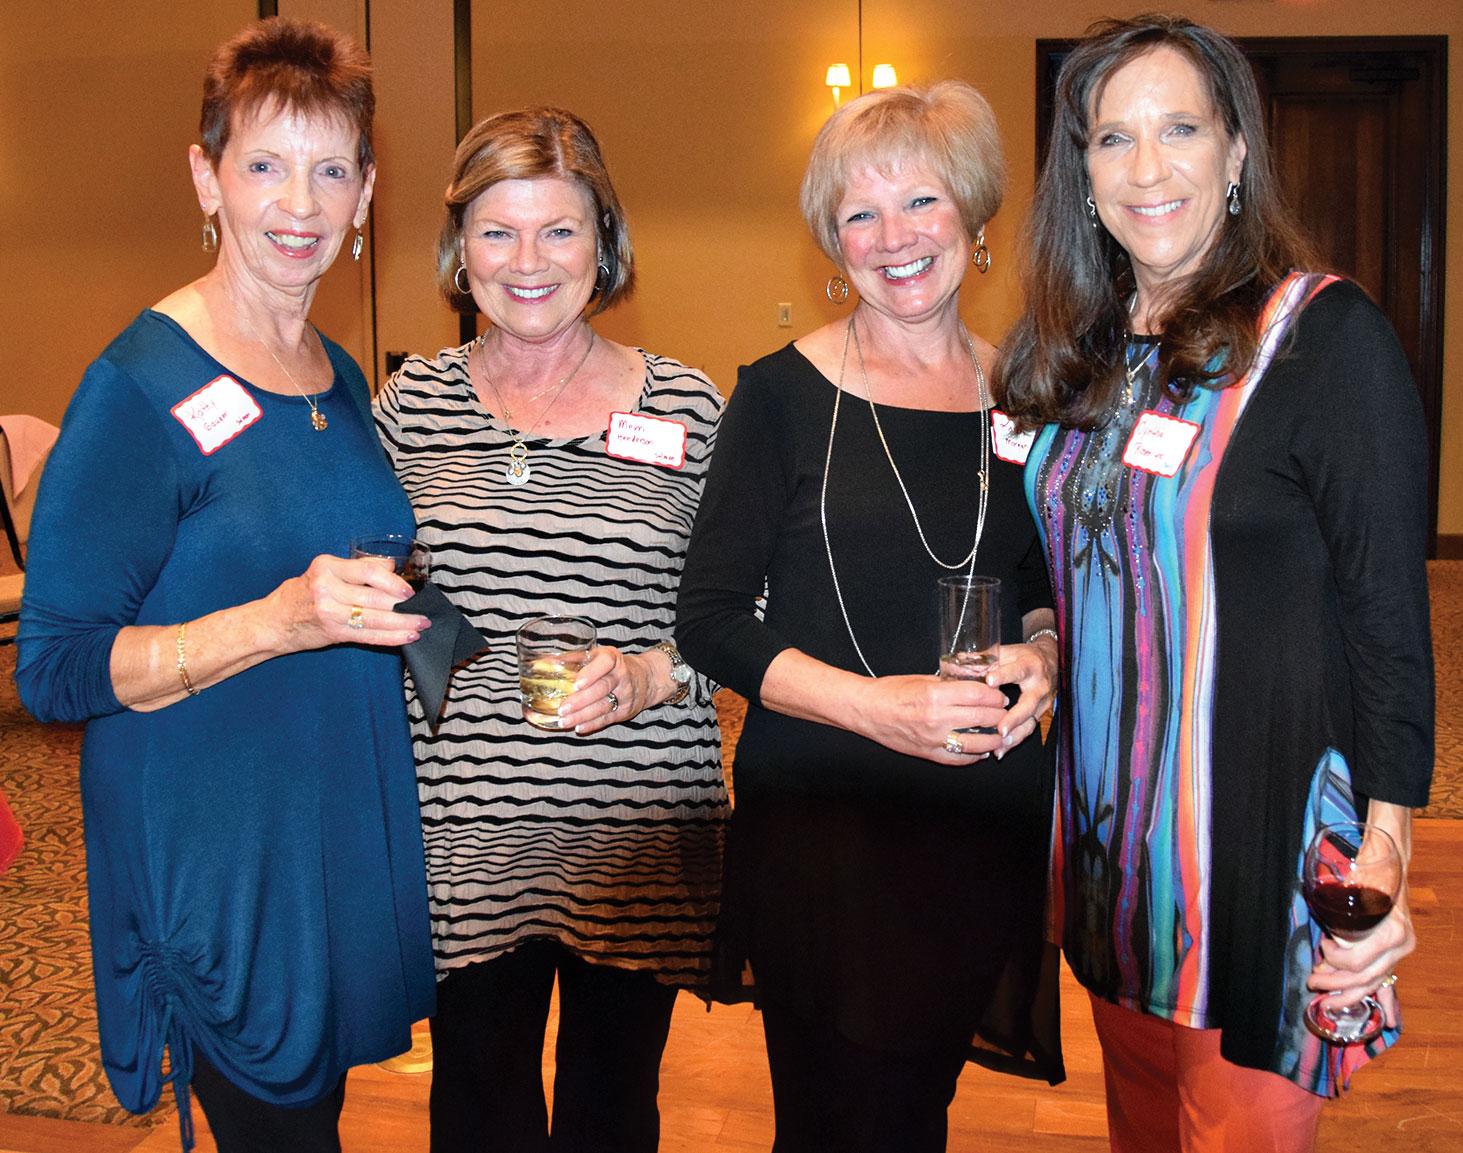 Enjoying the February 9 Minnesota Club dinner at the Madera Clubhouse are Kathy Gauger, Merri Henderson, Karen Morgan and Cynthia Rosenlund.